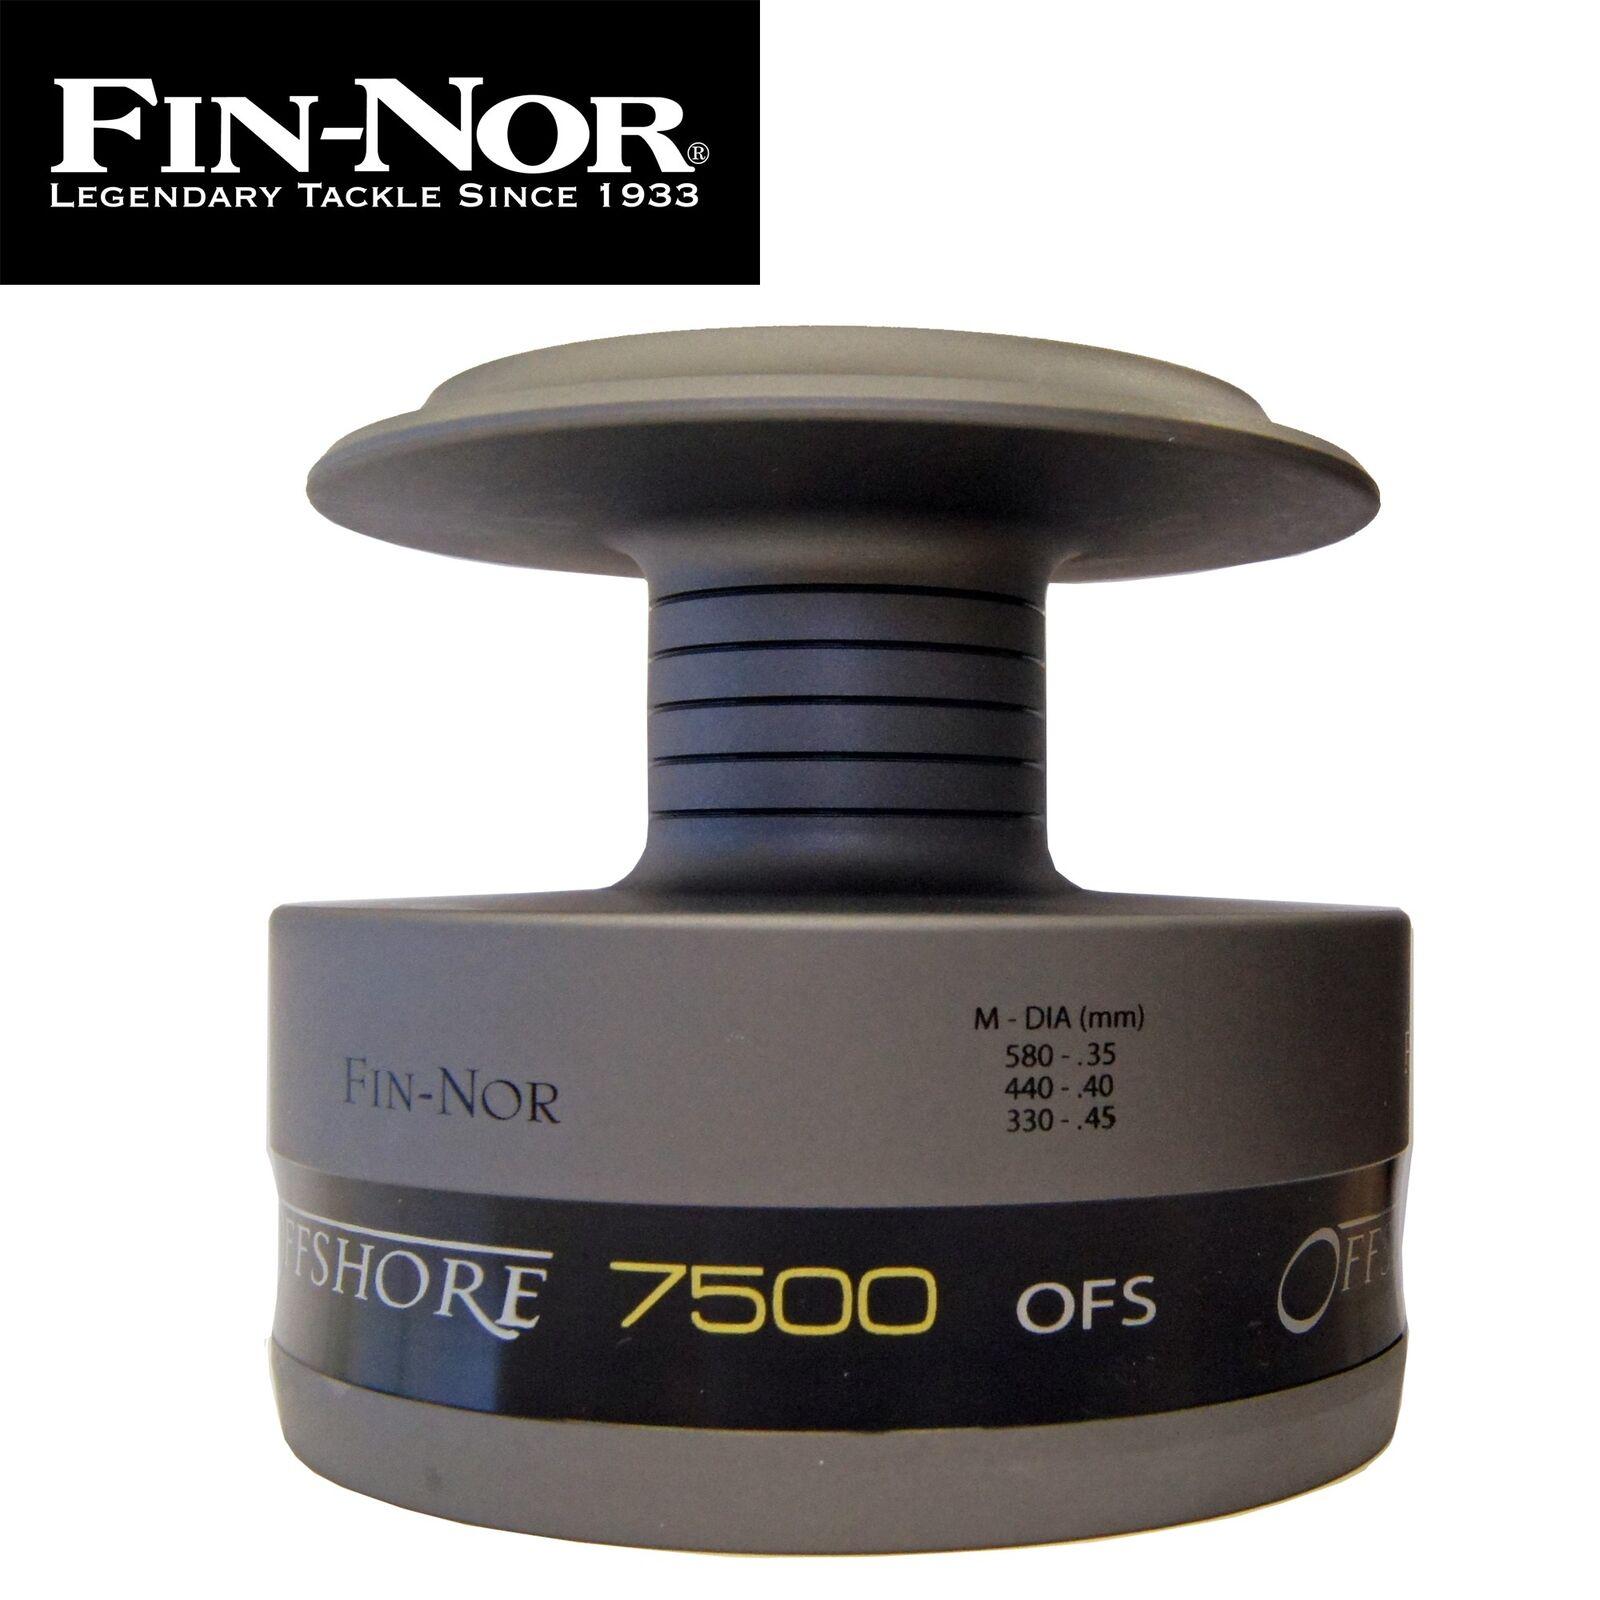 Fin-nor e-BOBINA FN SPINNING OFFSHORE SPINNING FN ofs7500-Bobina di ricambio per i ruoli stazionario c8be85